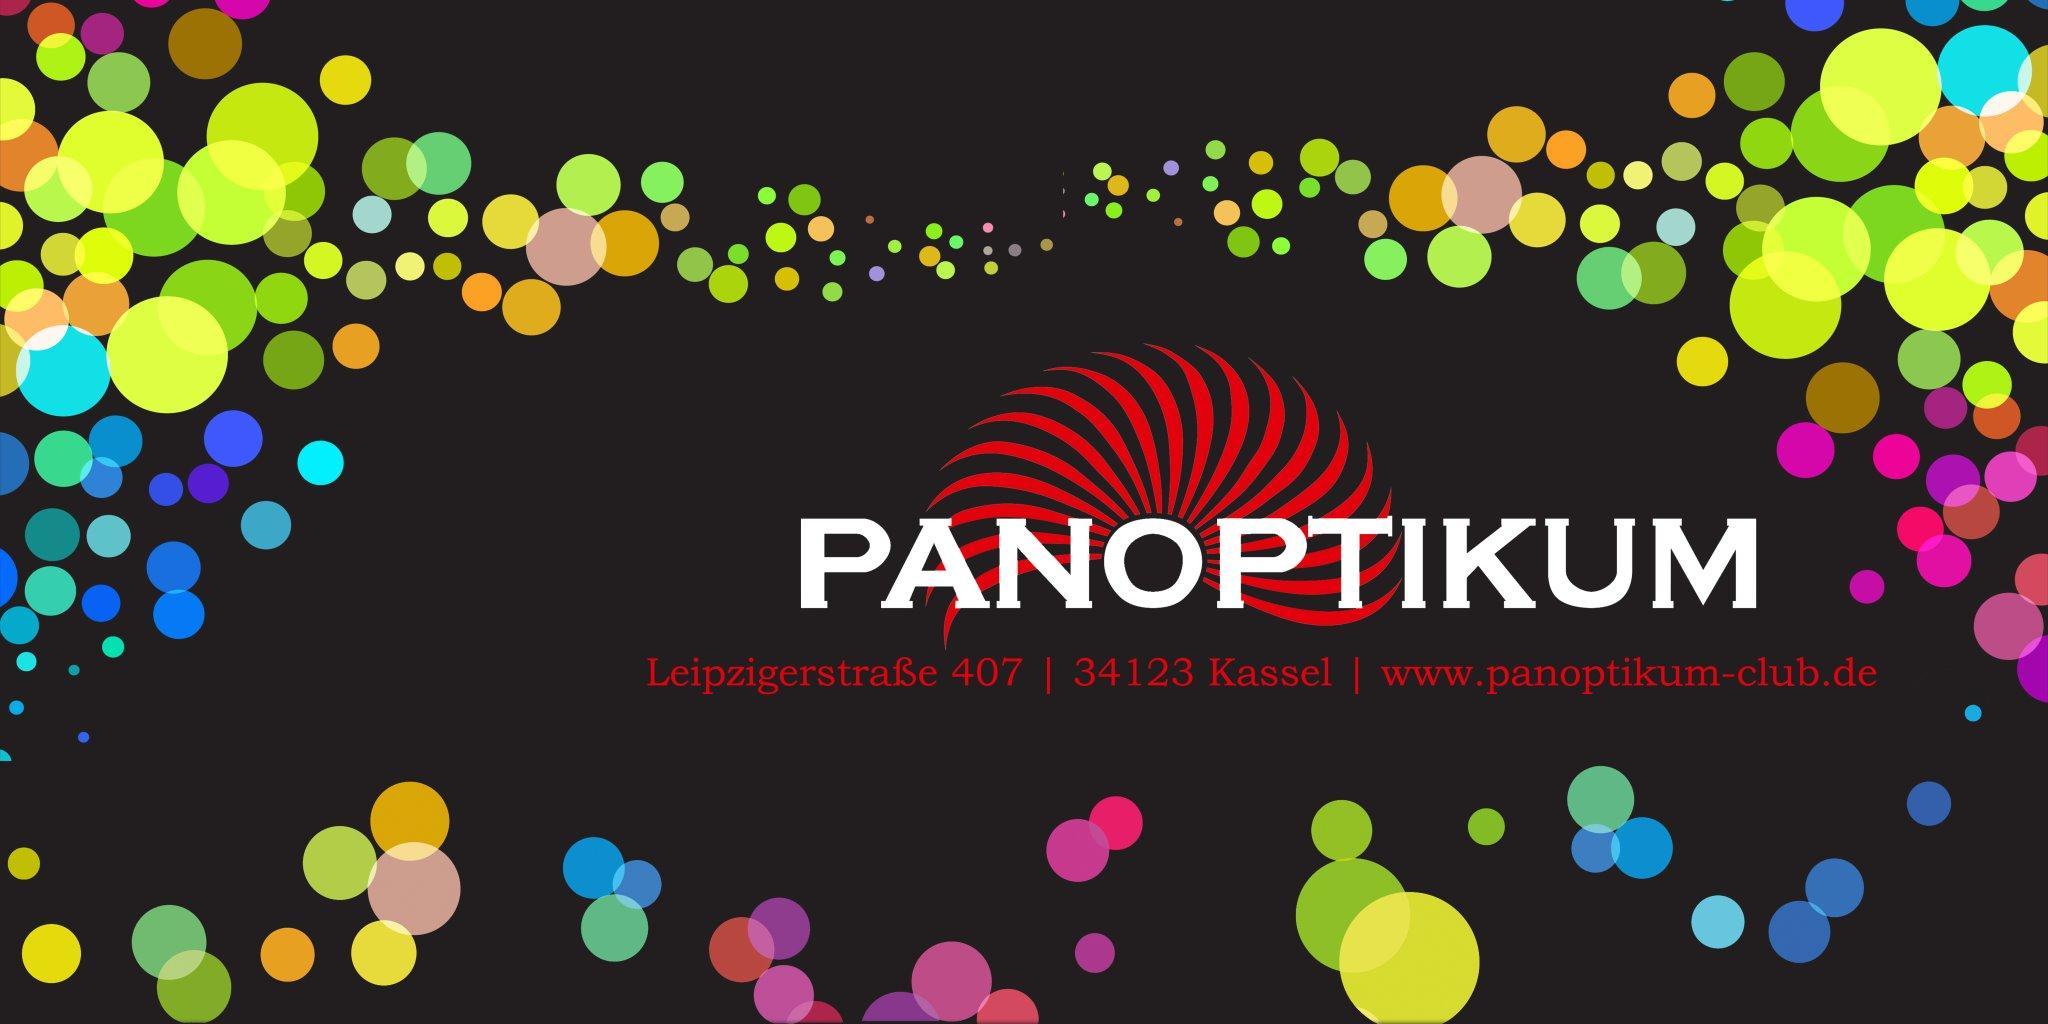 Panoptikum Club